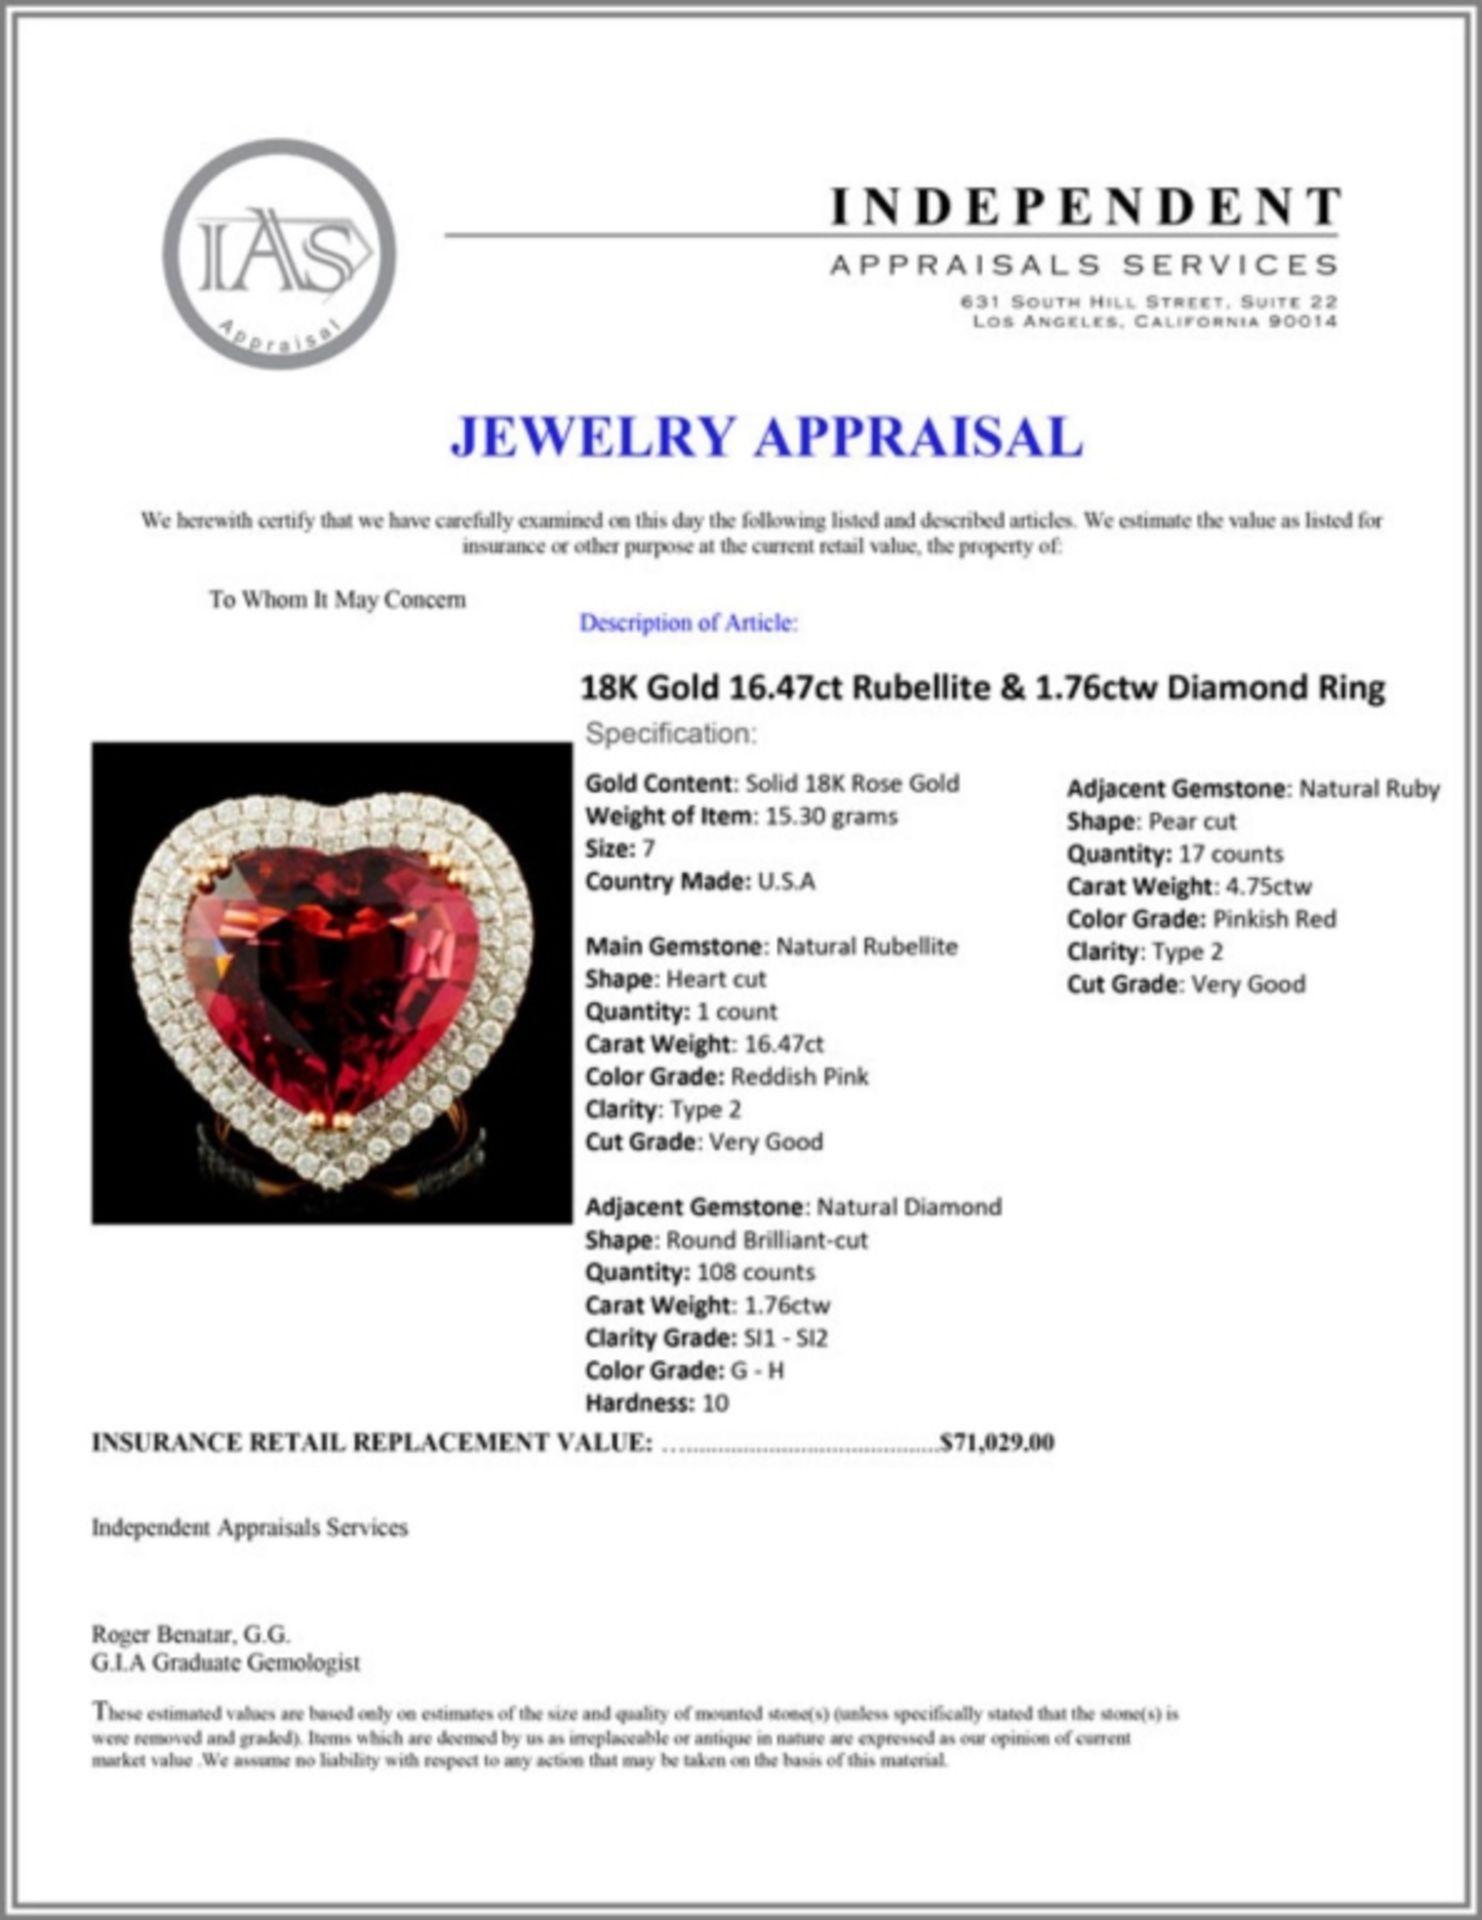 18K Gold 16.47ct Rubellite & 1.76ctw Diamond Ring - Image 6 of 6